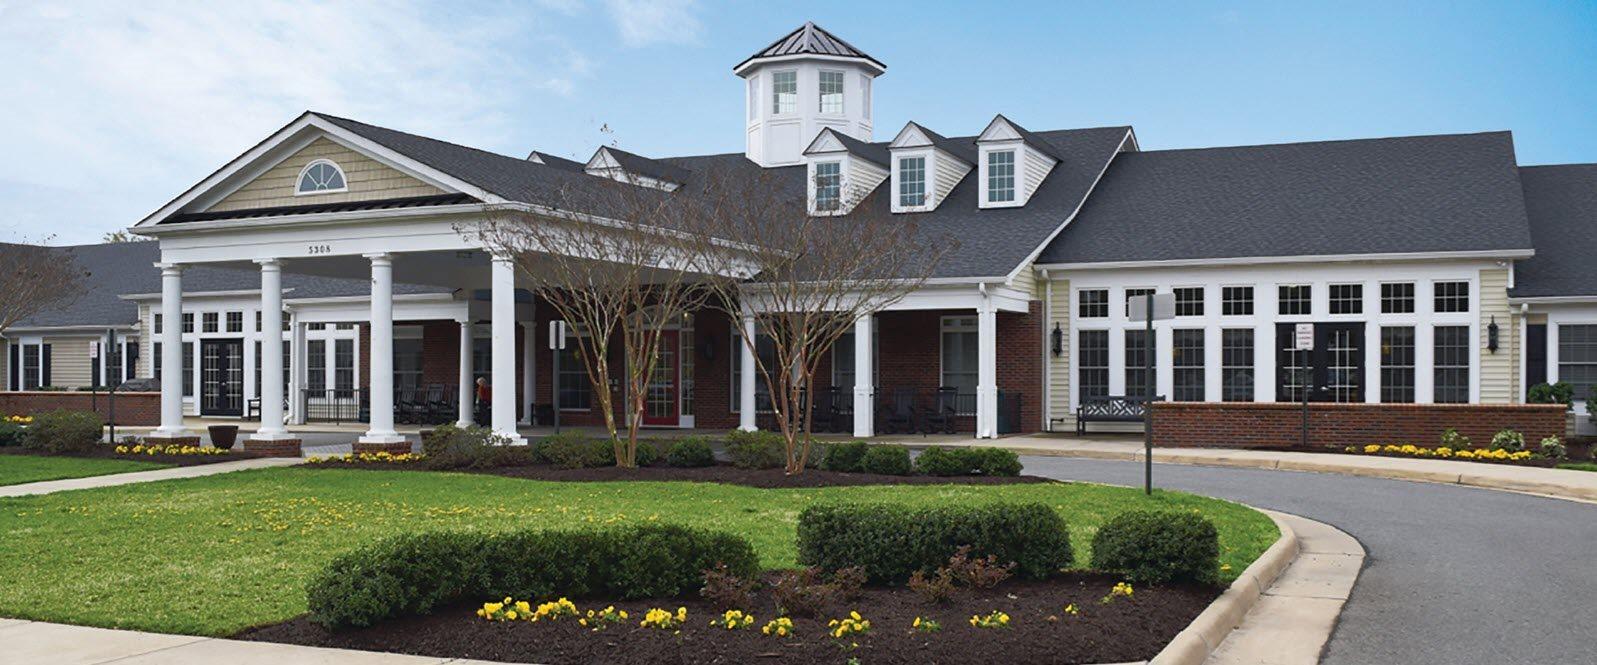 Exterior View at Spring Arbor of Fredericksburg, Fredericksburg, Virginia